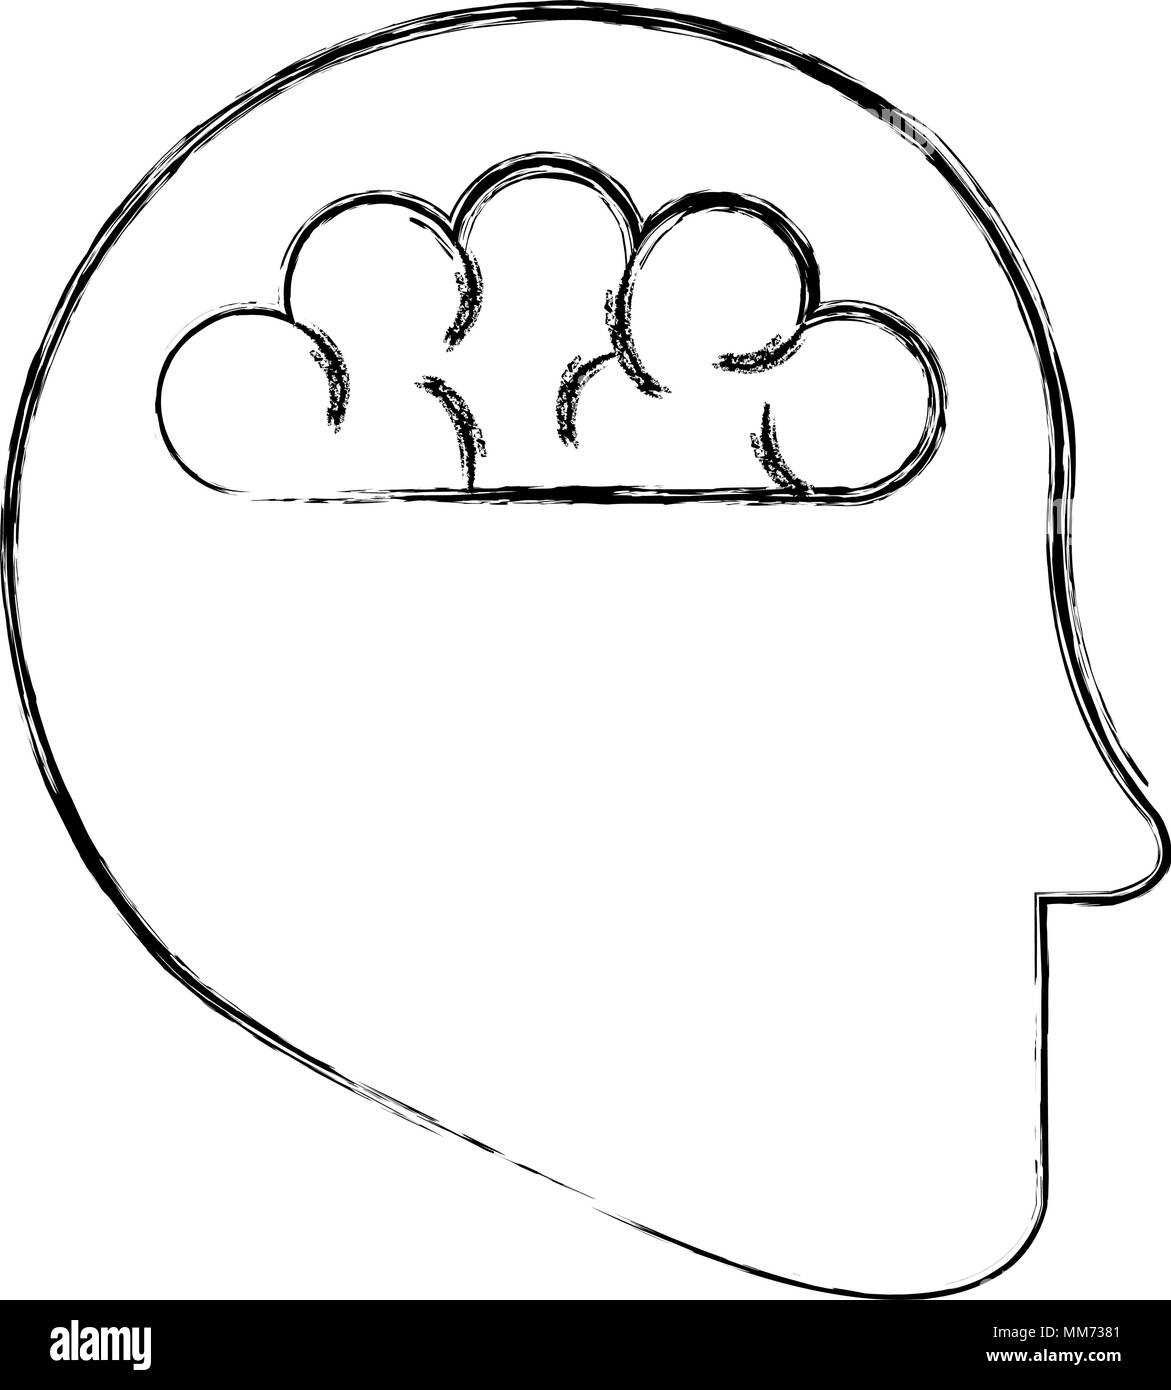 human profile with brain - Stock Image